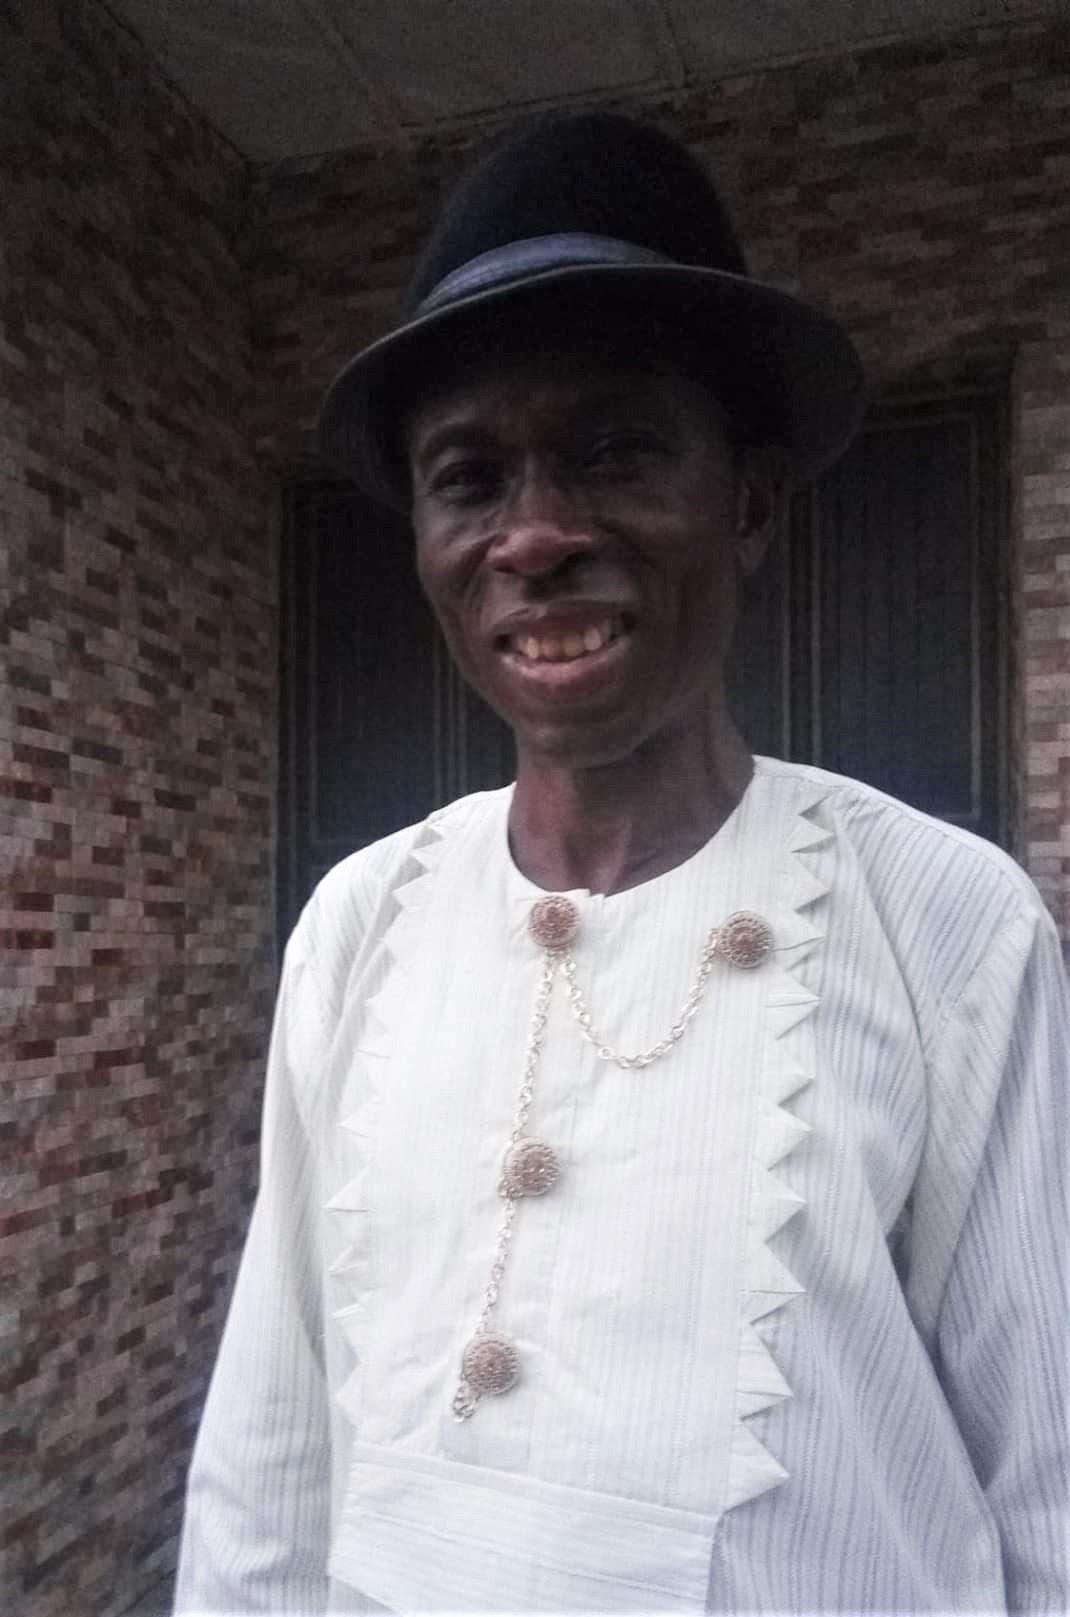 Professor Felix Ilesanmi, chaplain of Trinity Chapel at the Federal University of Technology, Yola, was kidnapped in northeastern Nigeria. (Morning Star News)